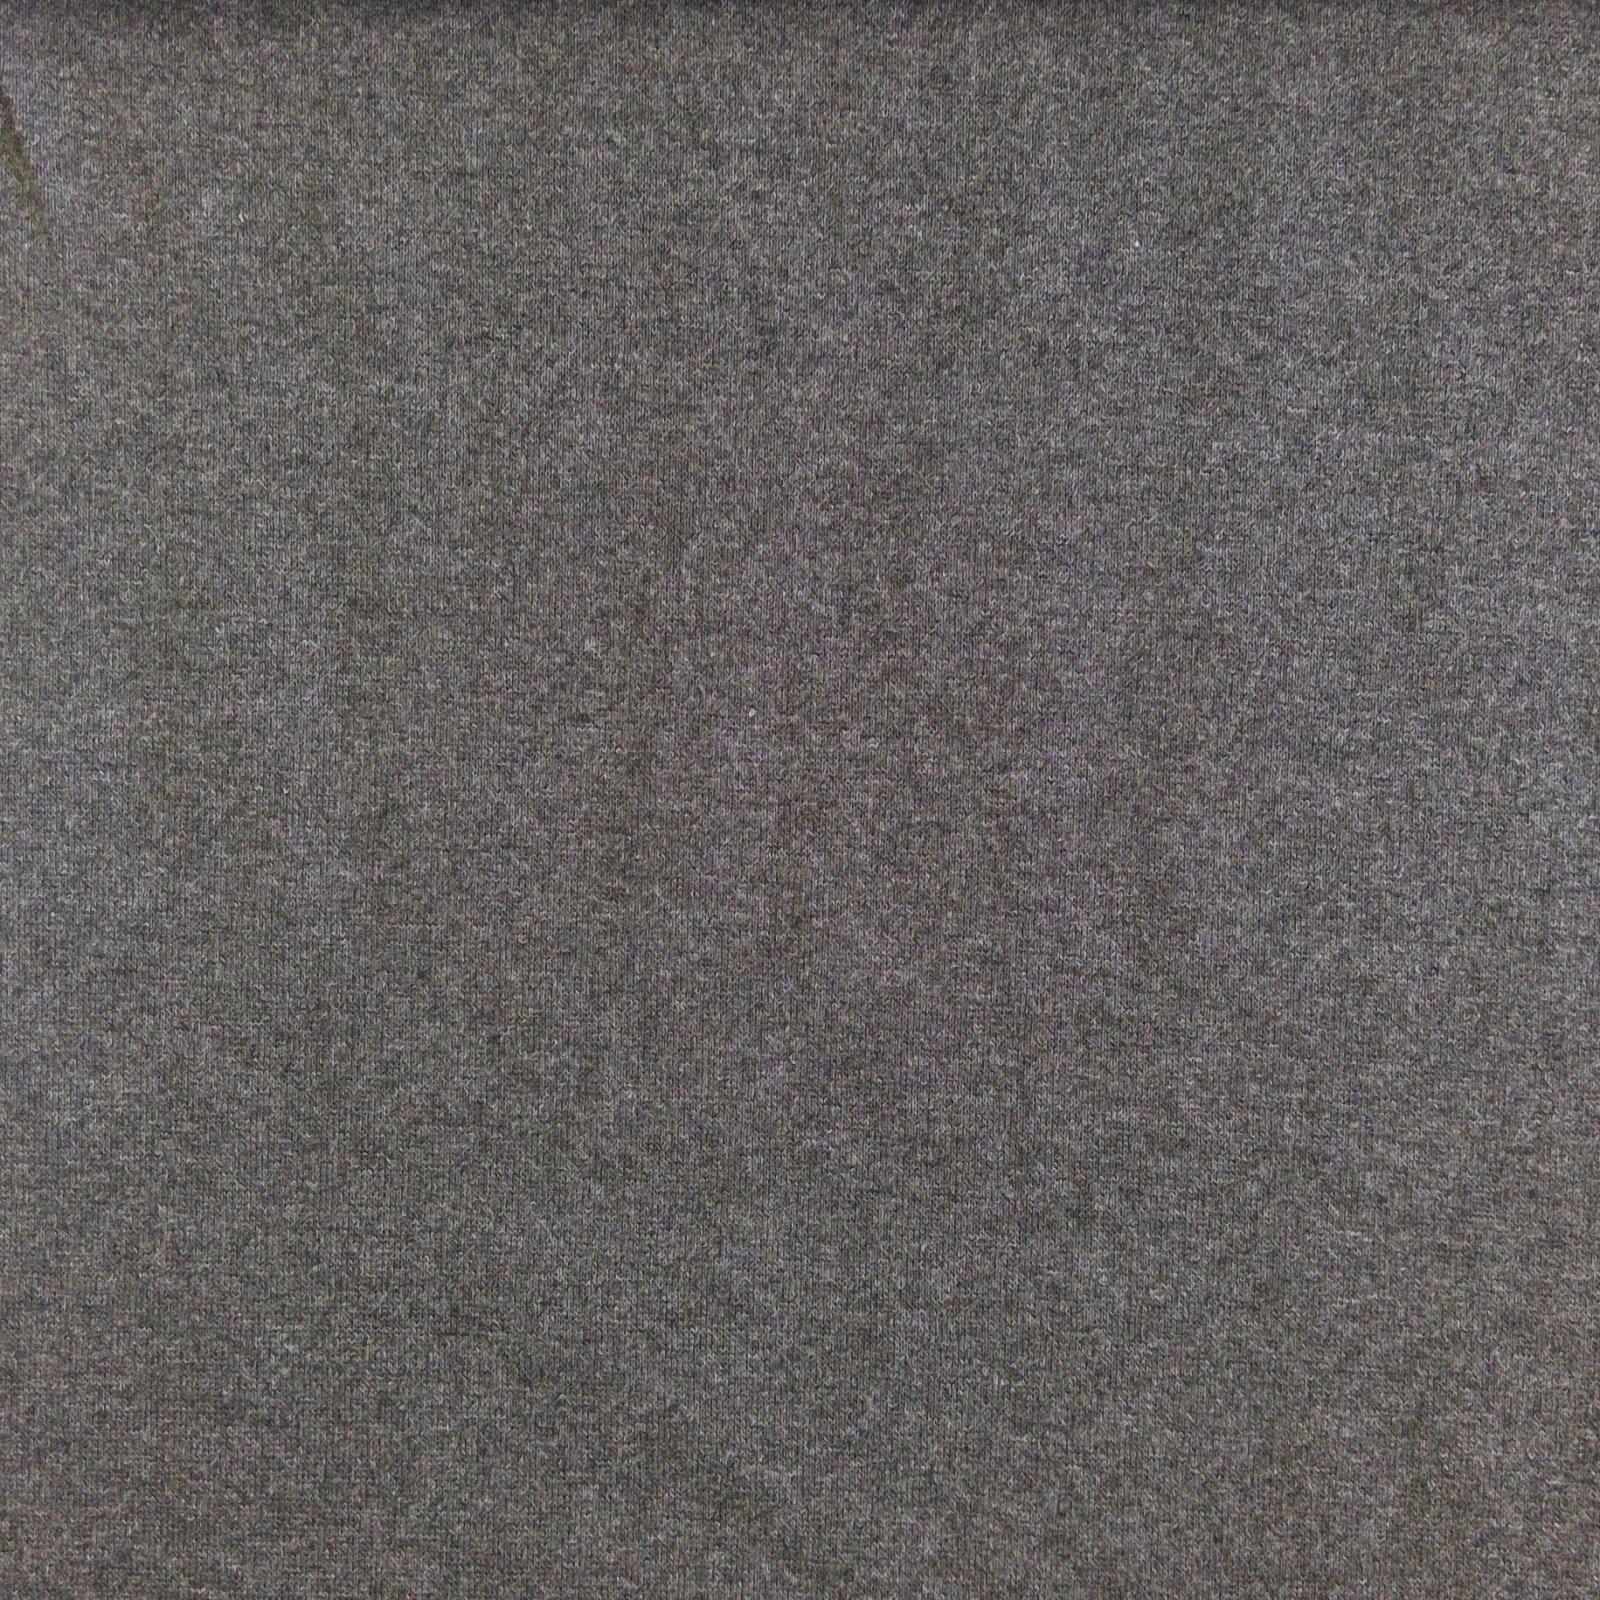 Ribknit Cotton Blend, Bare Knits, Granite